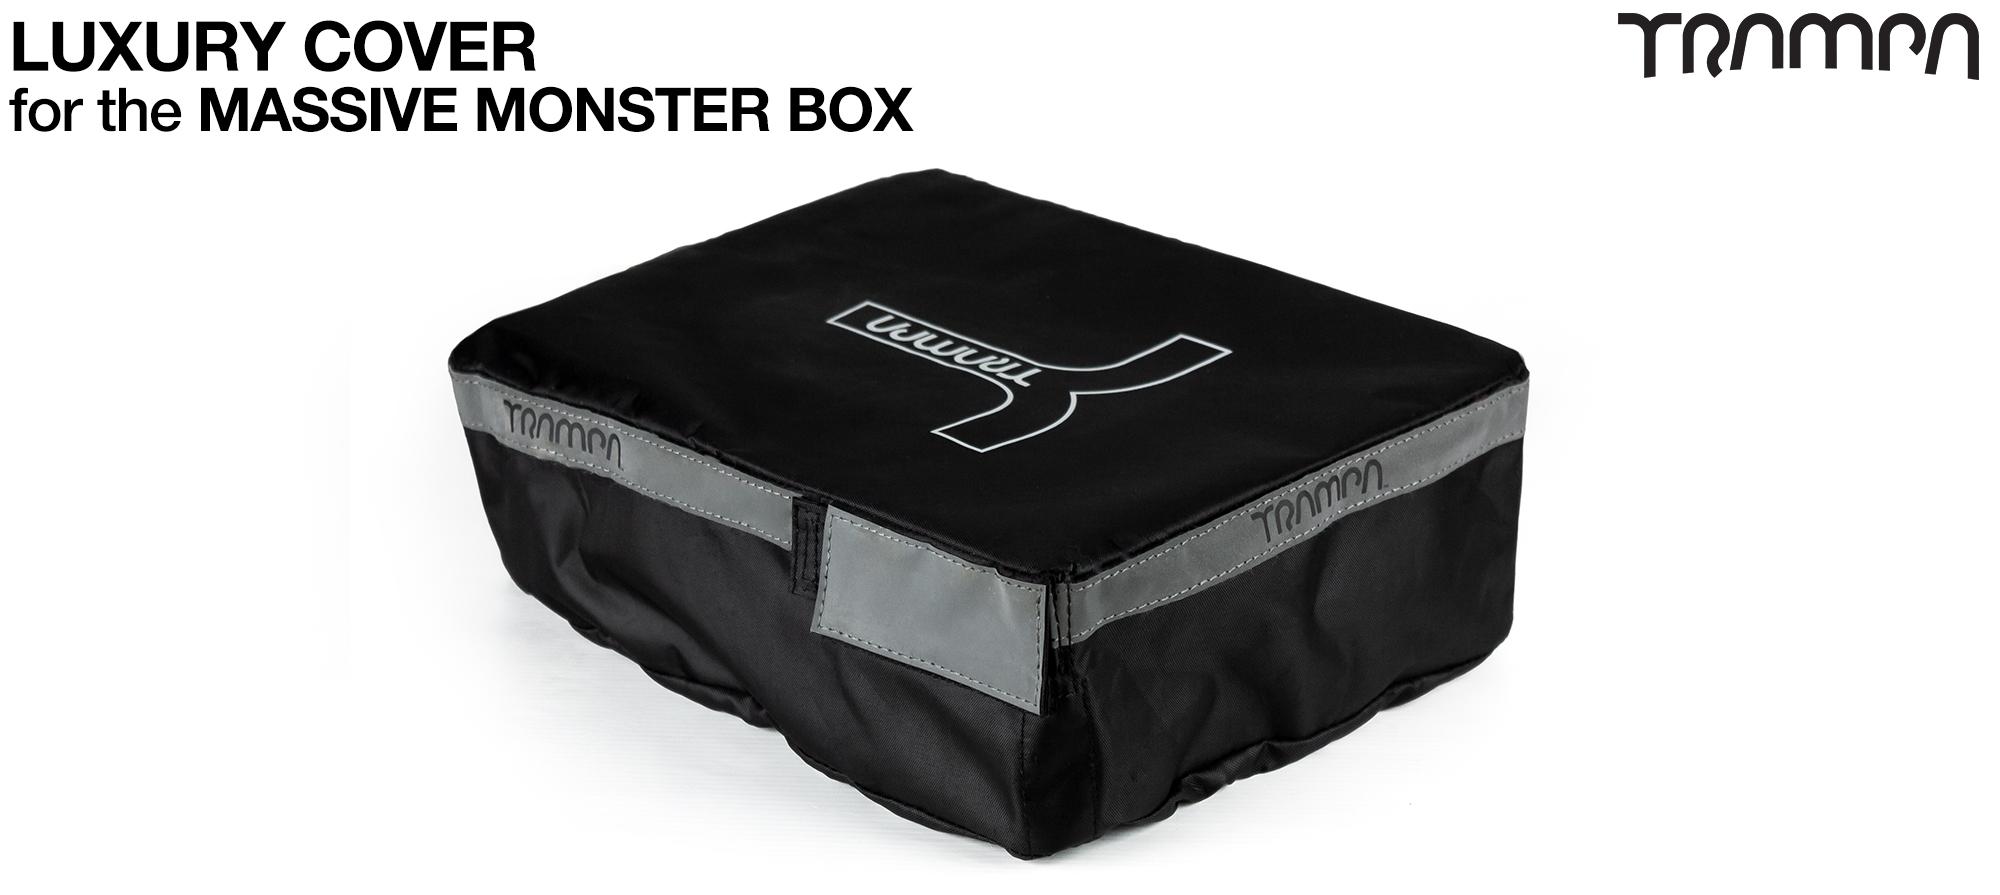 Please add a Heavy Duty (LUXURY) MASSIVE Monster Box cover (+£30)